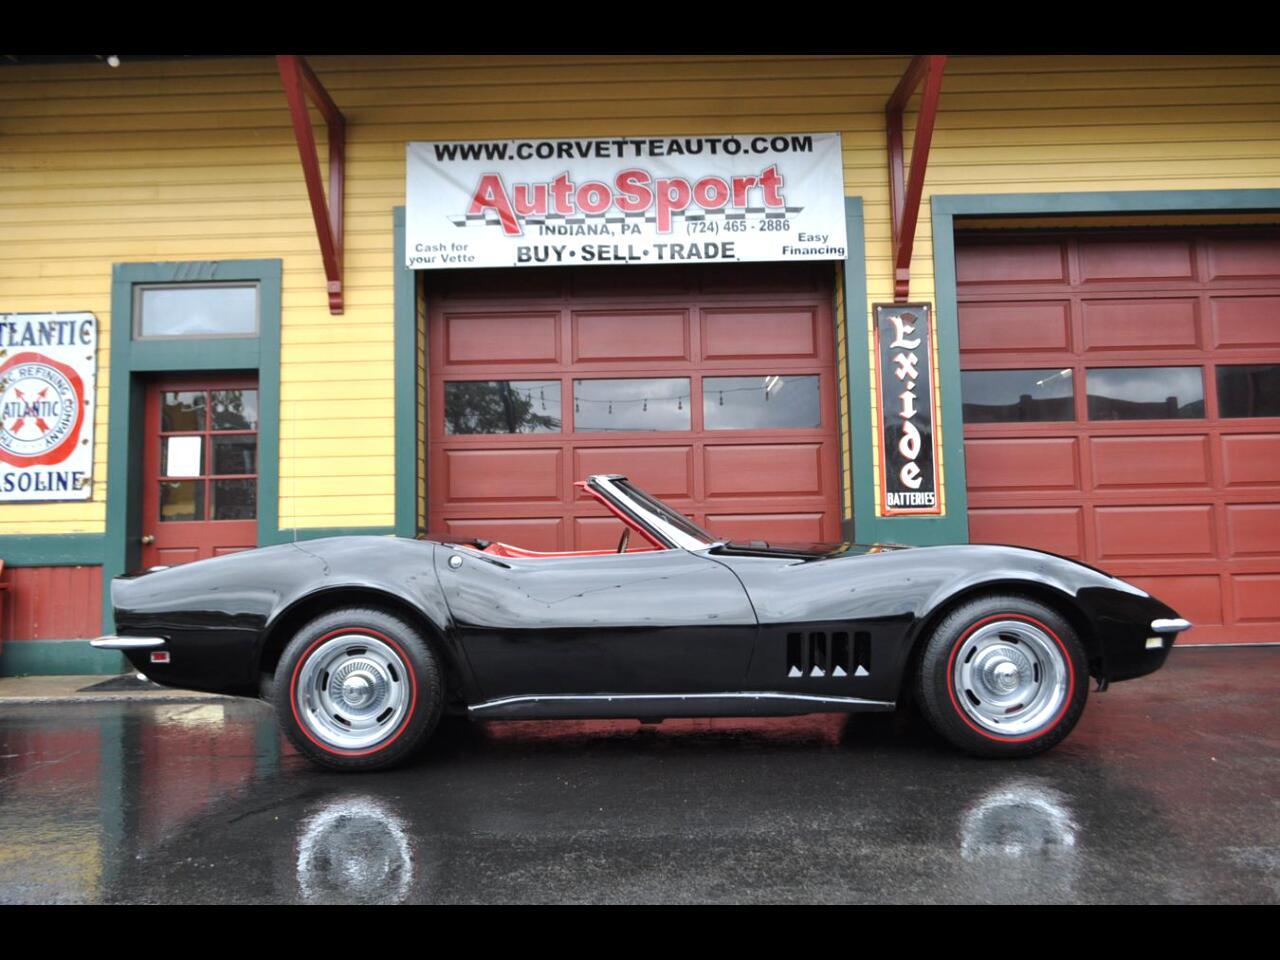 1968 Chevrolet Corvette Extremely Rare Tuxedo Black/Red 350hp #'s Matching